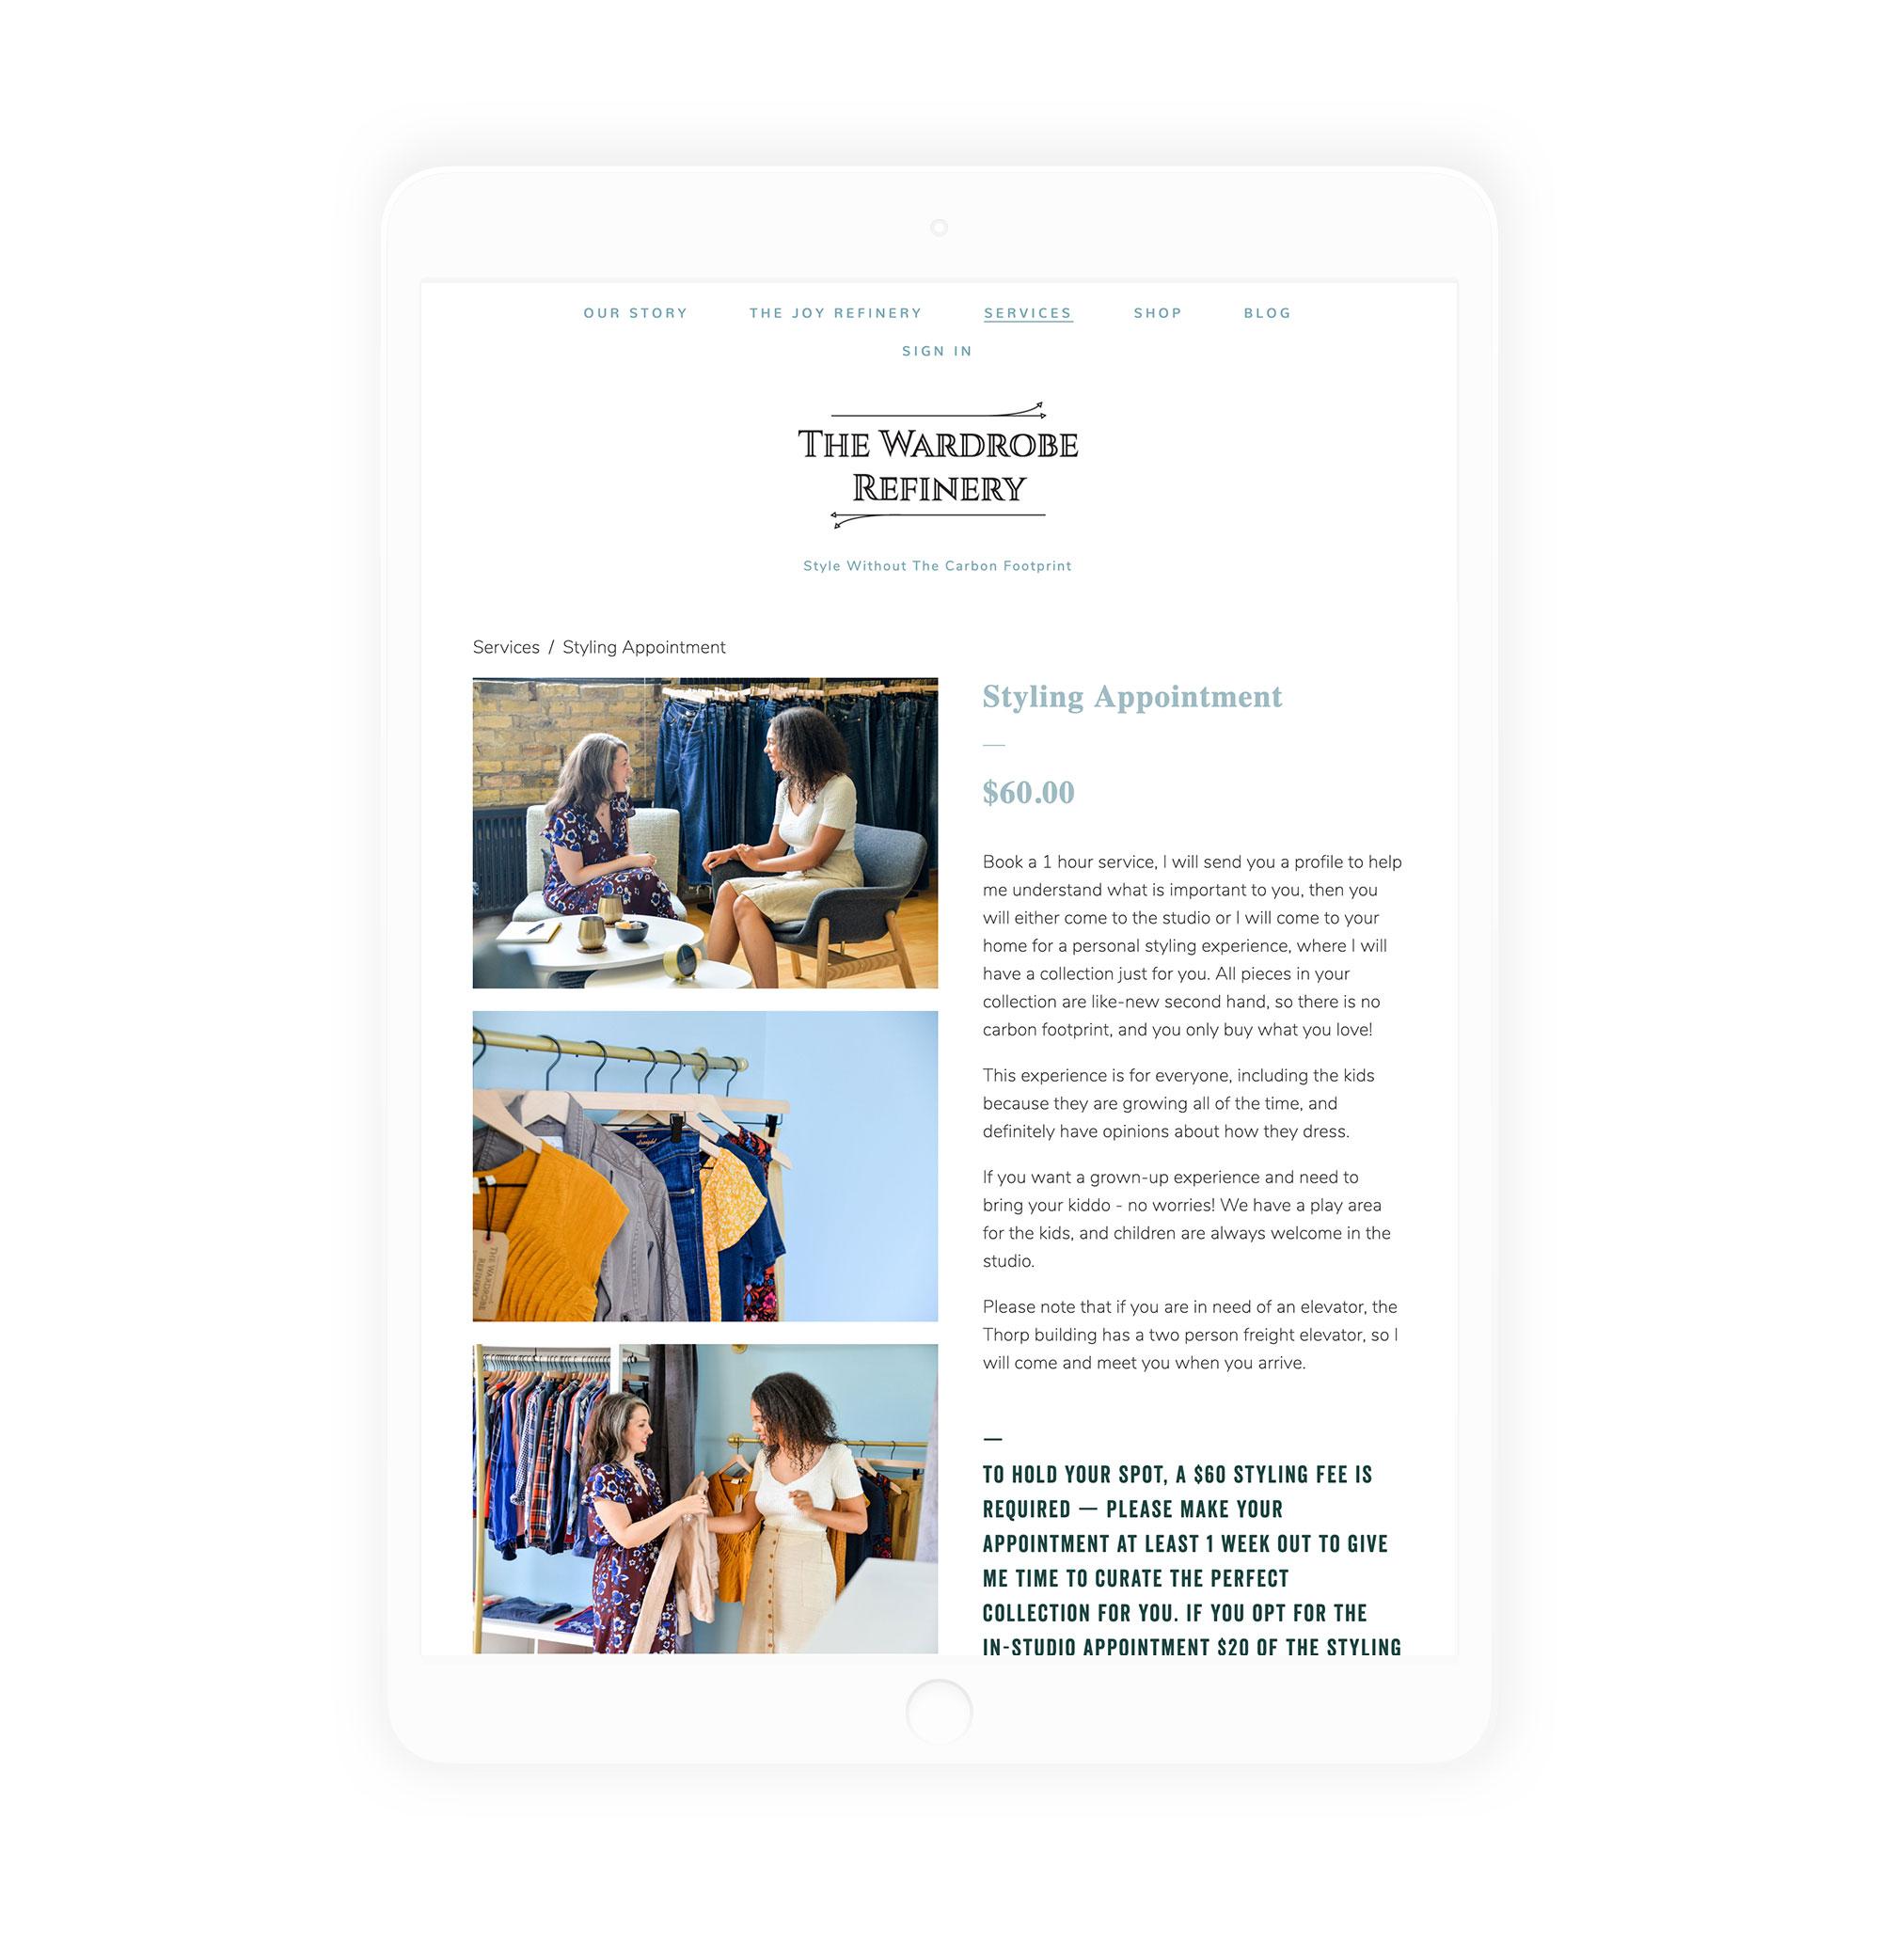 wardrobe-refinery-web-iPad-3.jpg